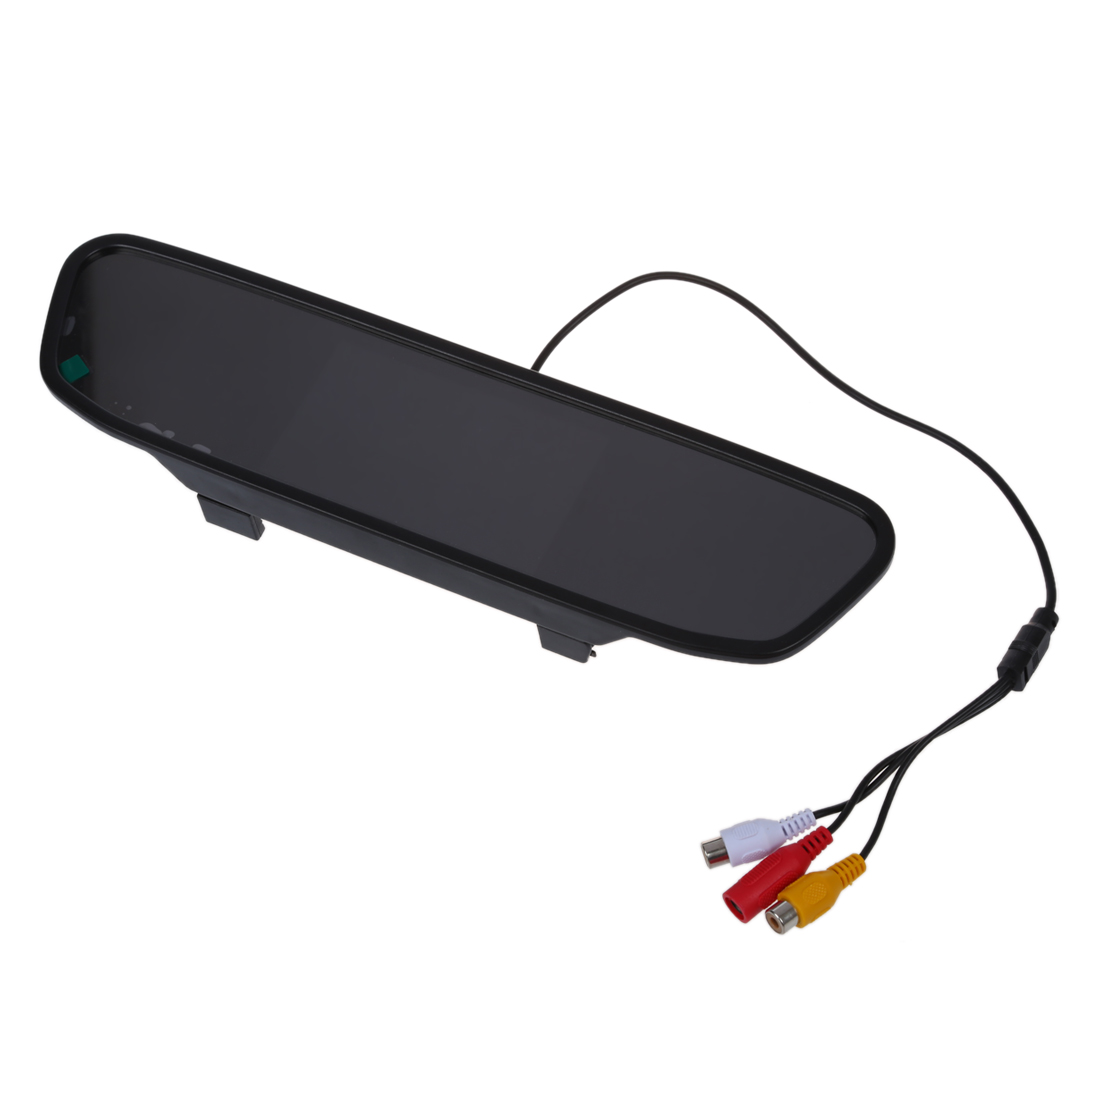 4.3 TFT LCD Display Monitor rearview mirror rearview mirror AUTO CAR DVD AV